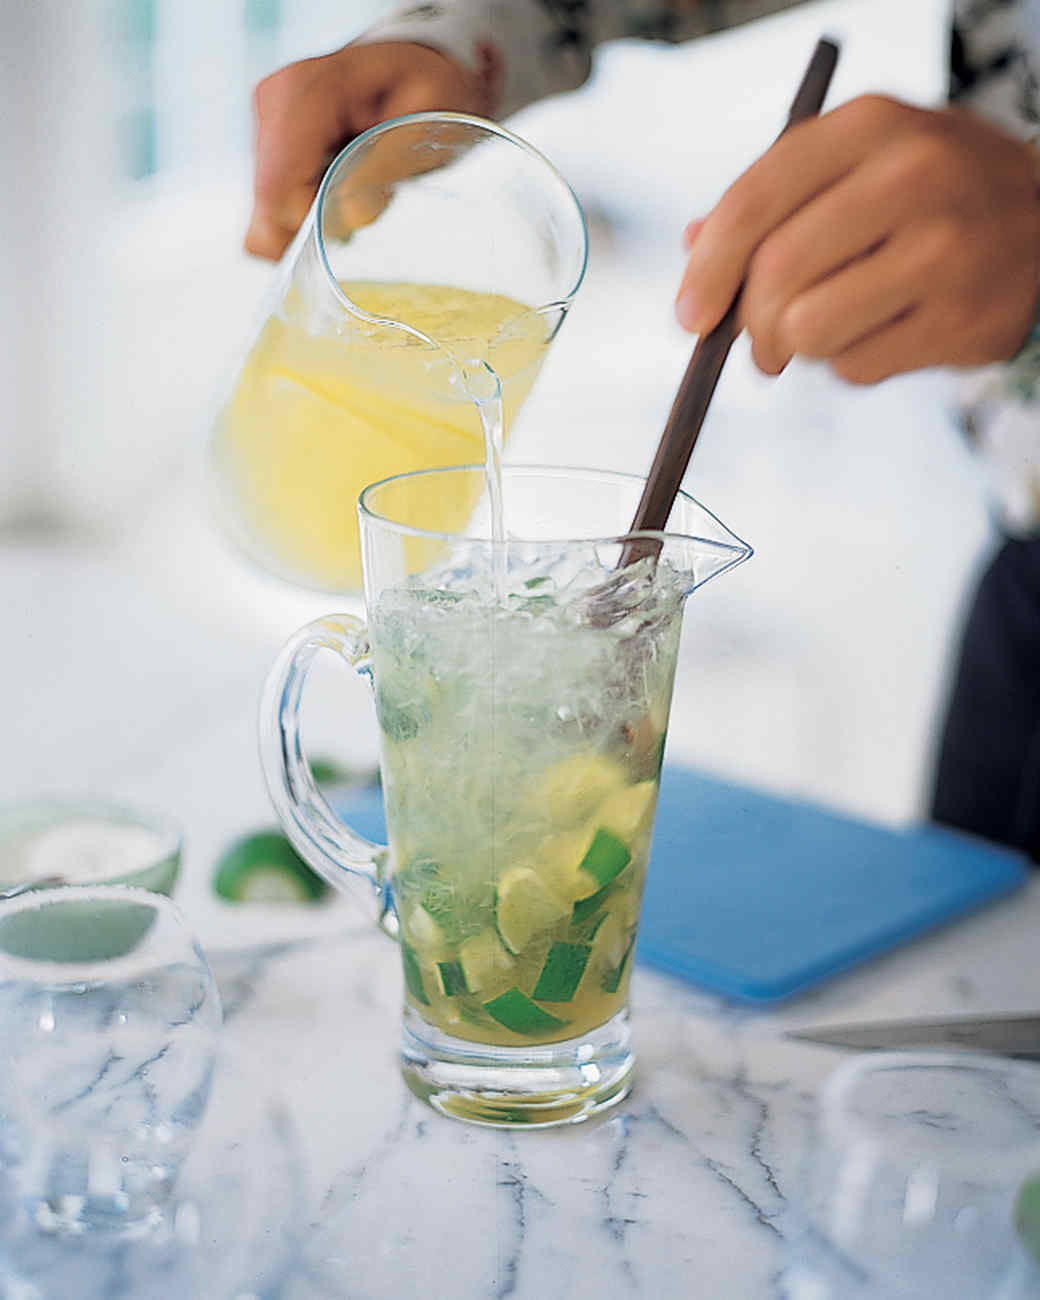 lemonade-caipirinhas-ent05-mla100251.jpg